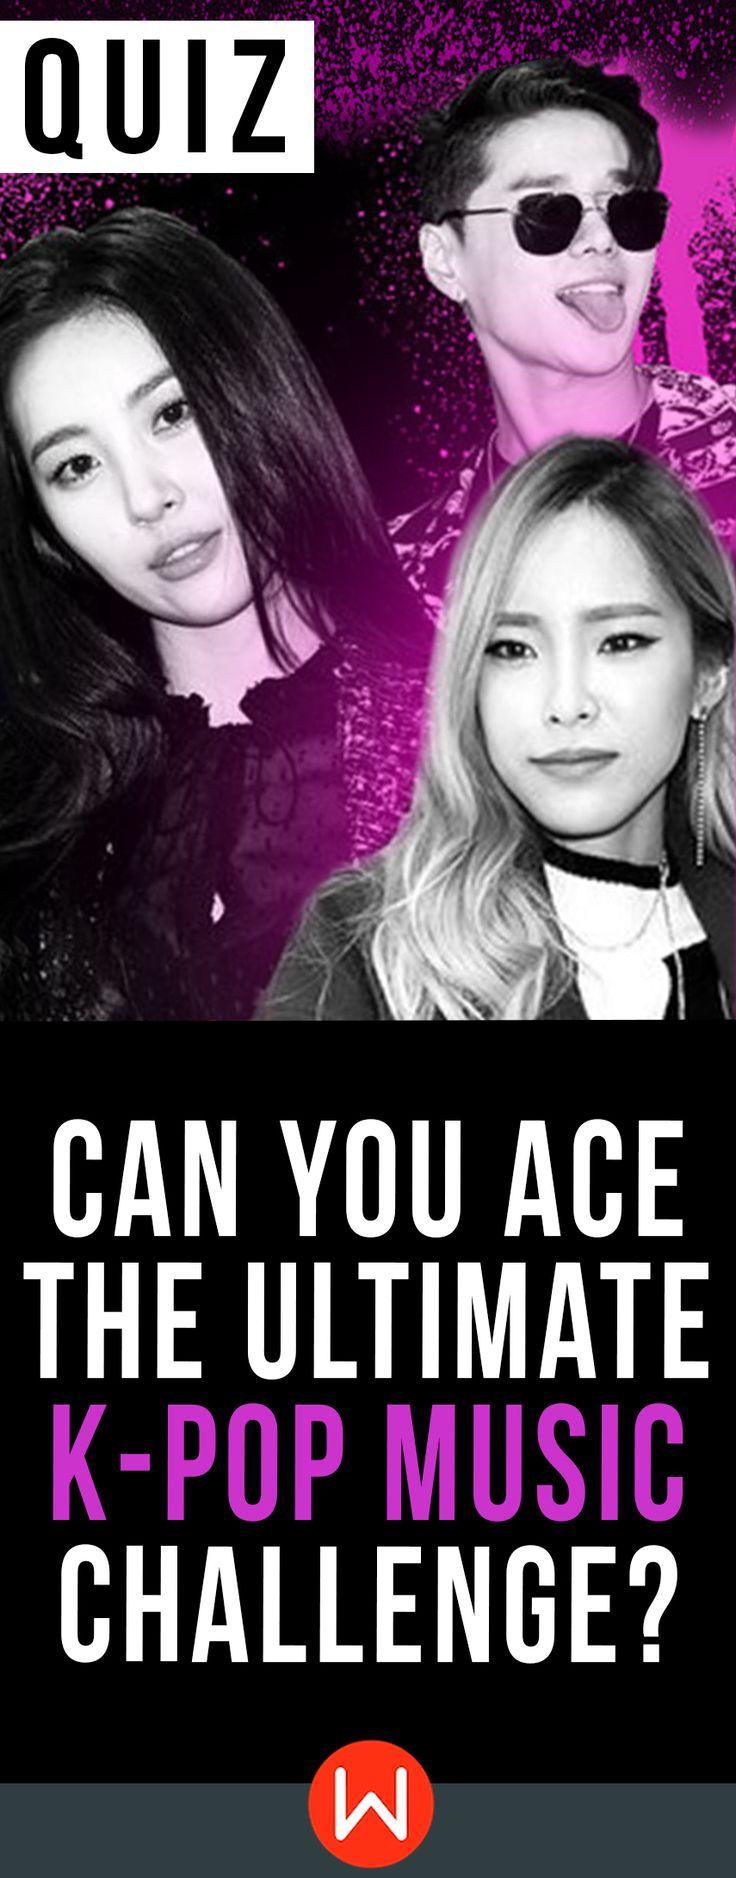 K-POP quiz: Can you ace this K-POP knowledge test? K-POP music quiz.buzzfeed quizzes, playbuzz quiz, fun test, music quiz. Are you daebak enough?